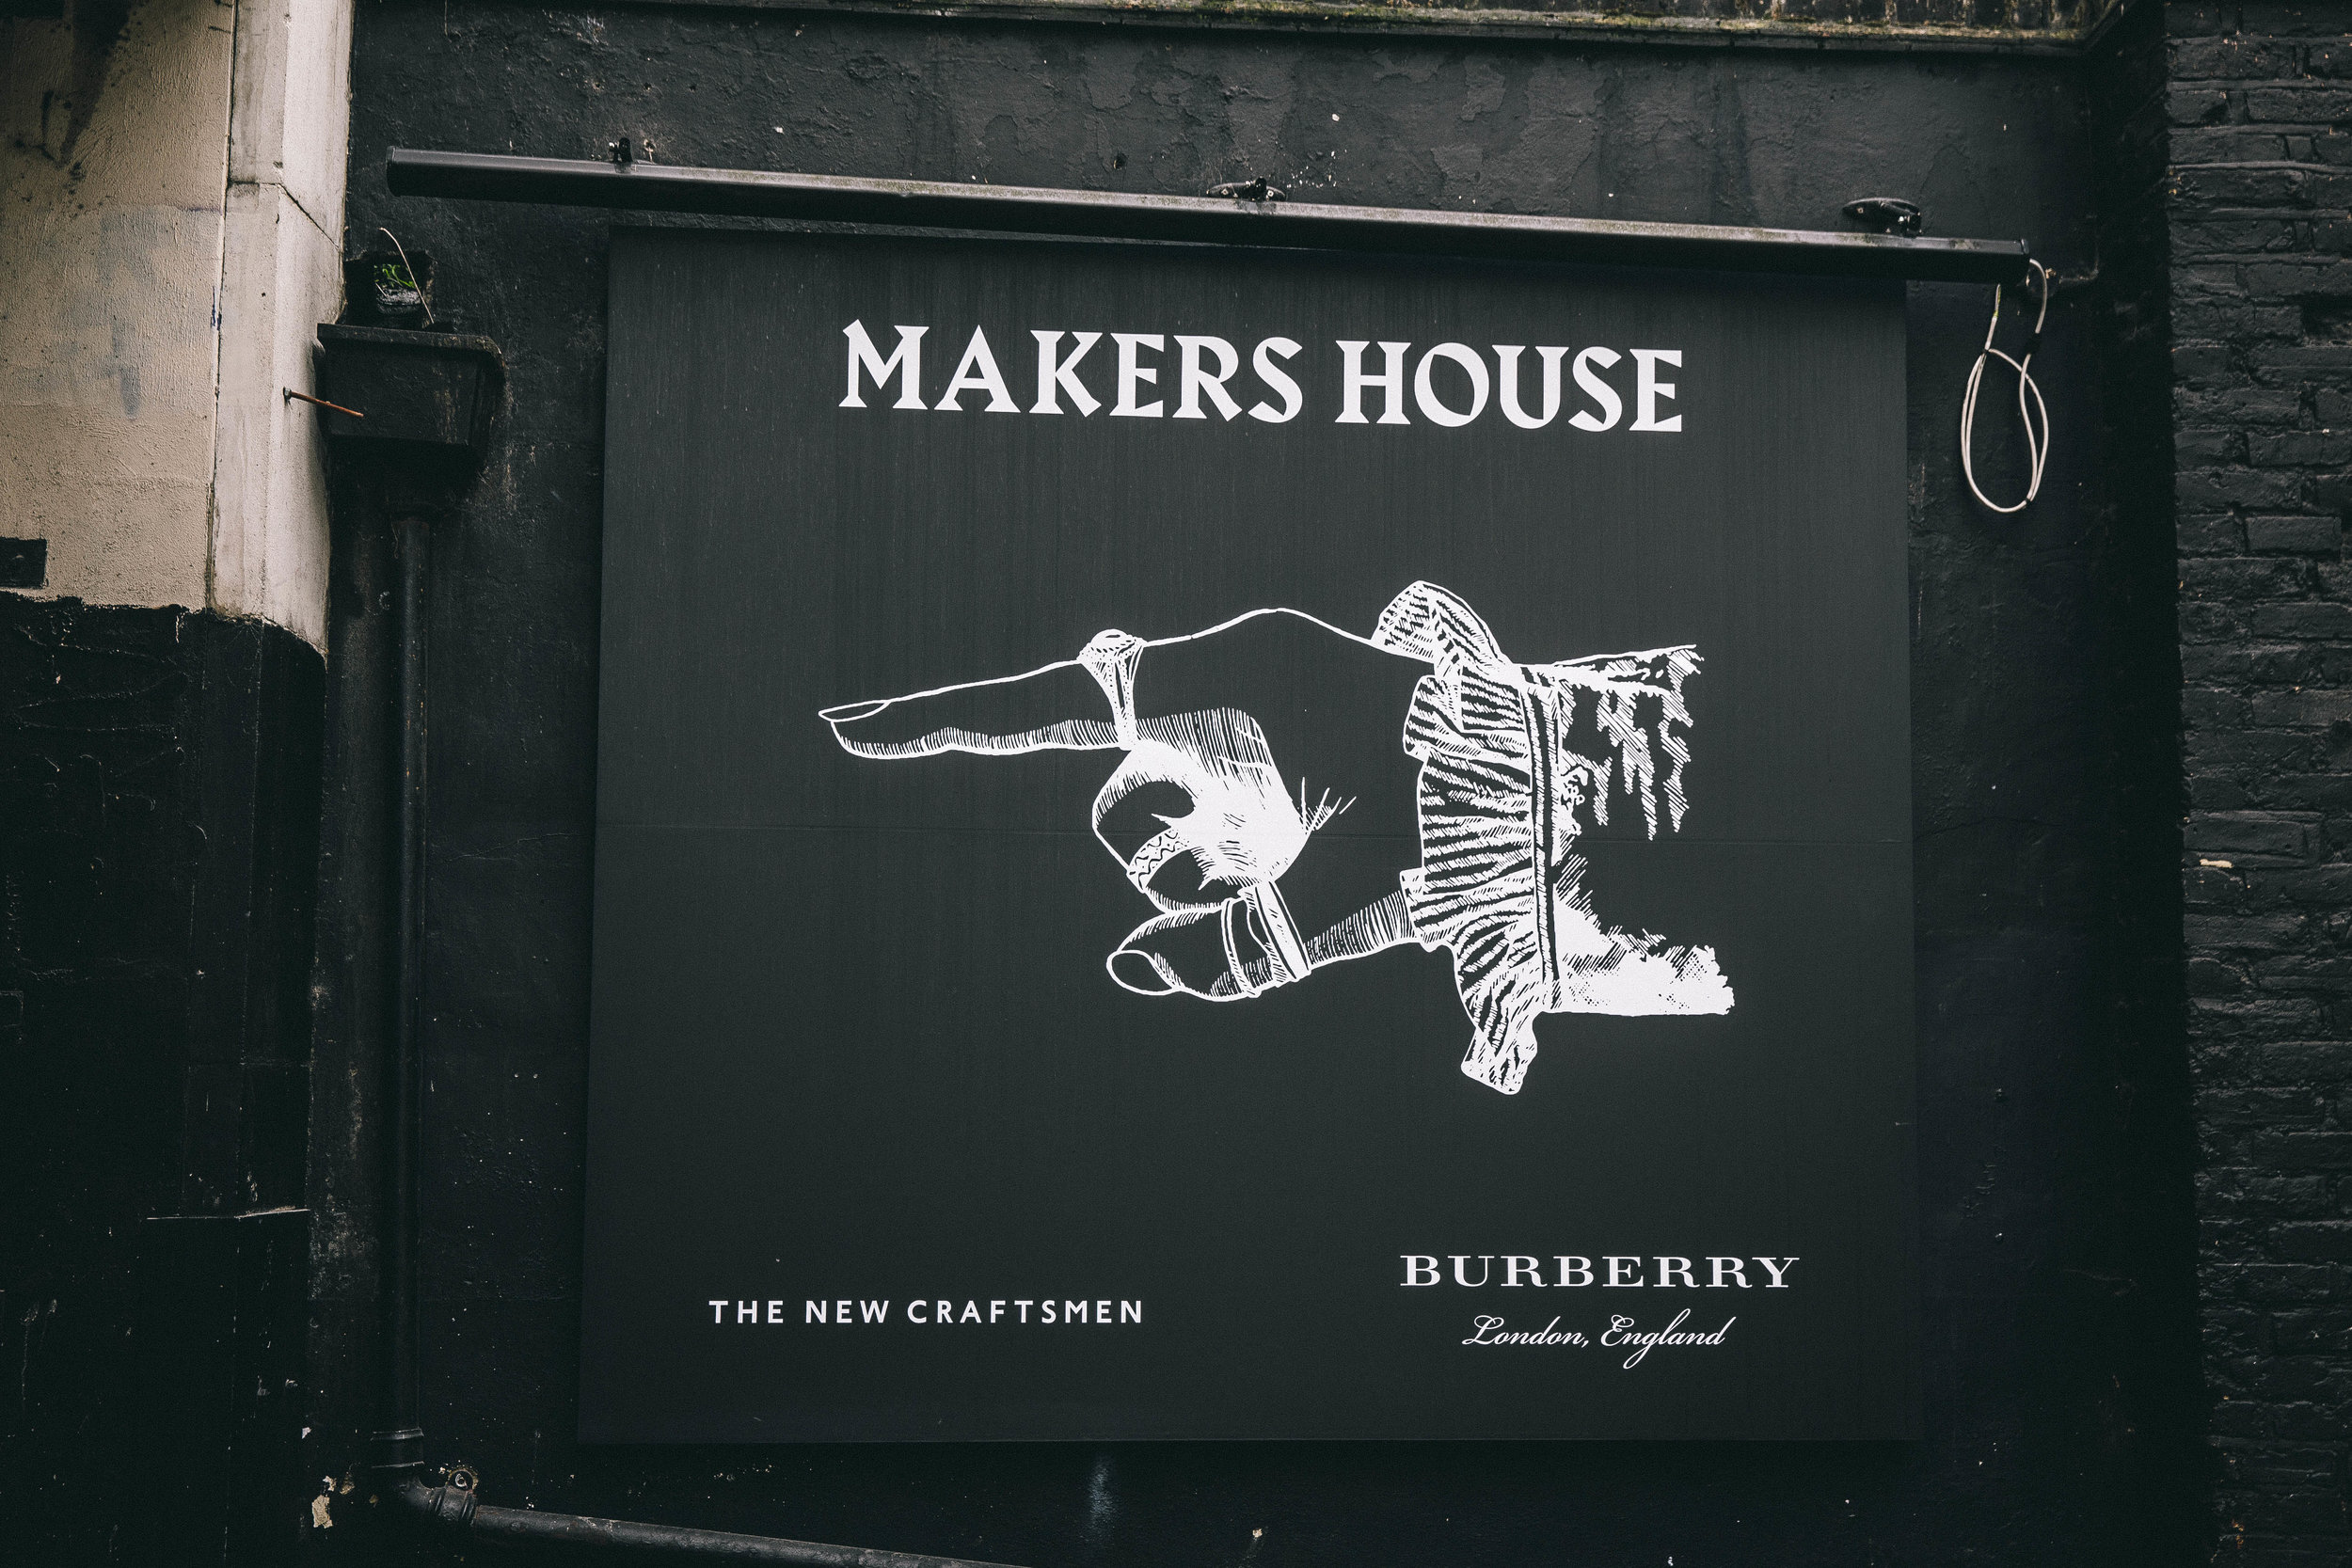 BURBERRY_MAKERSHOUSE_01.jpg